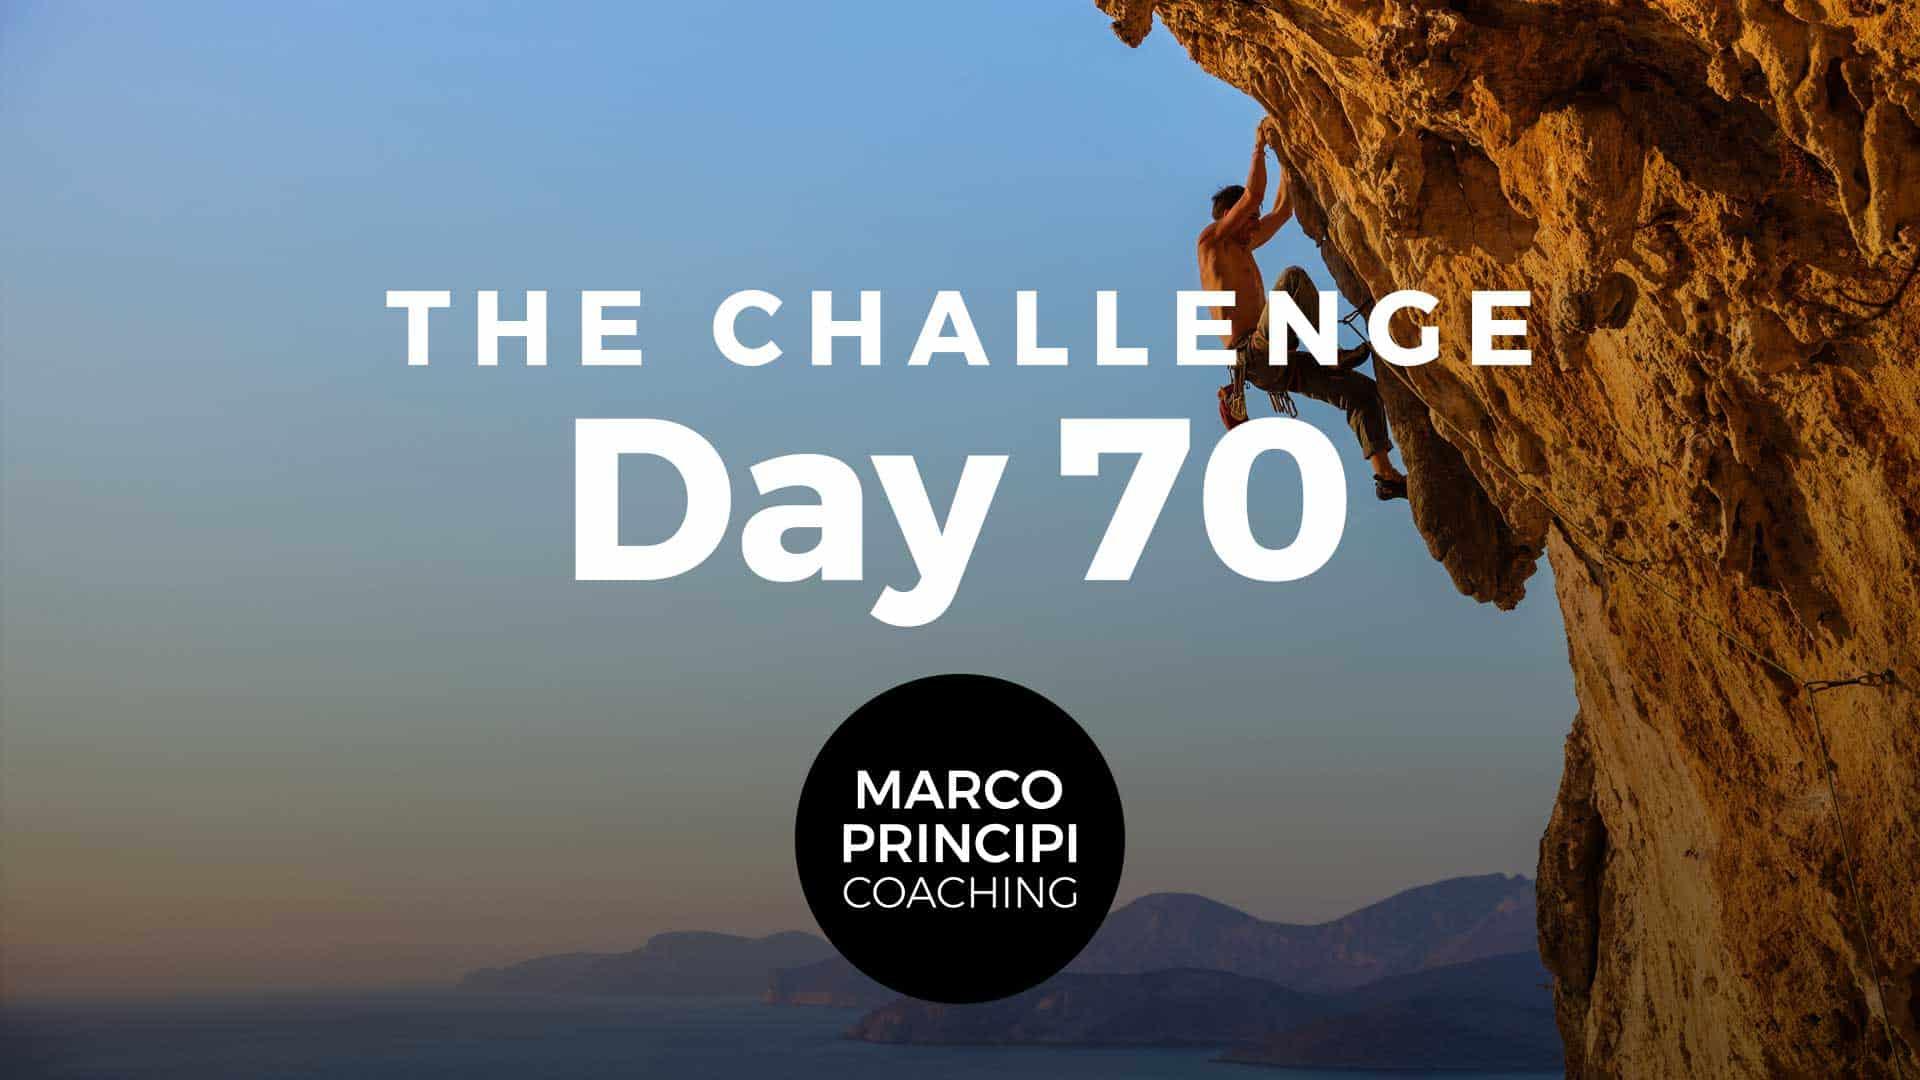 Marco Principi Coaching Challenge Day 70